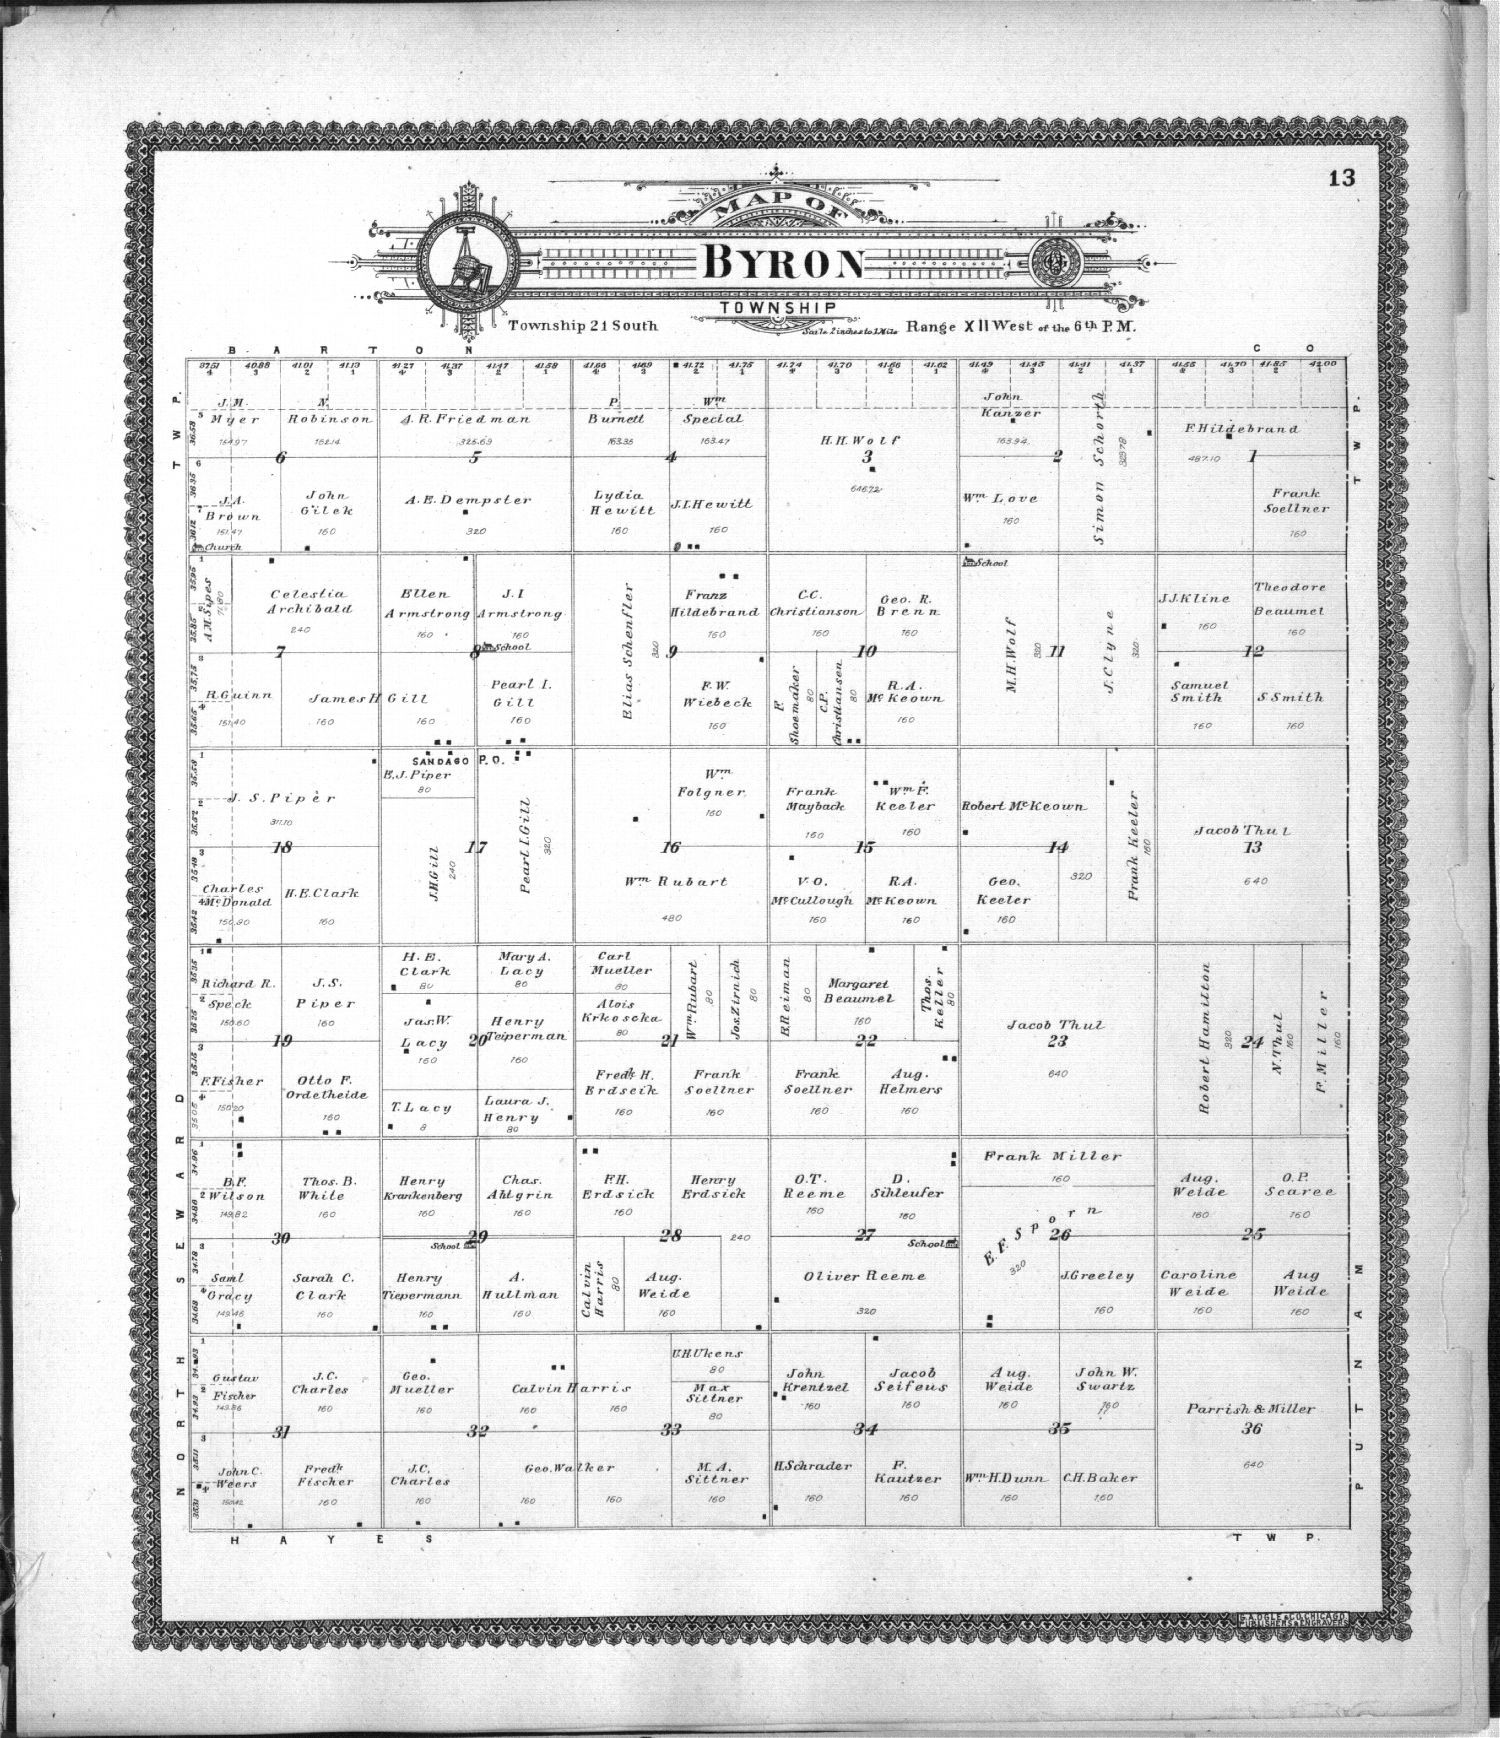 Standard atlas of Stafford County, Kansas - 13